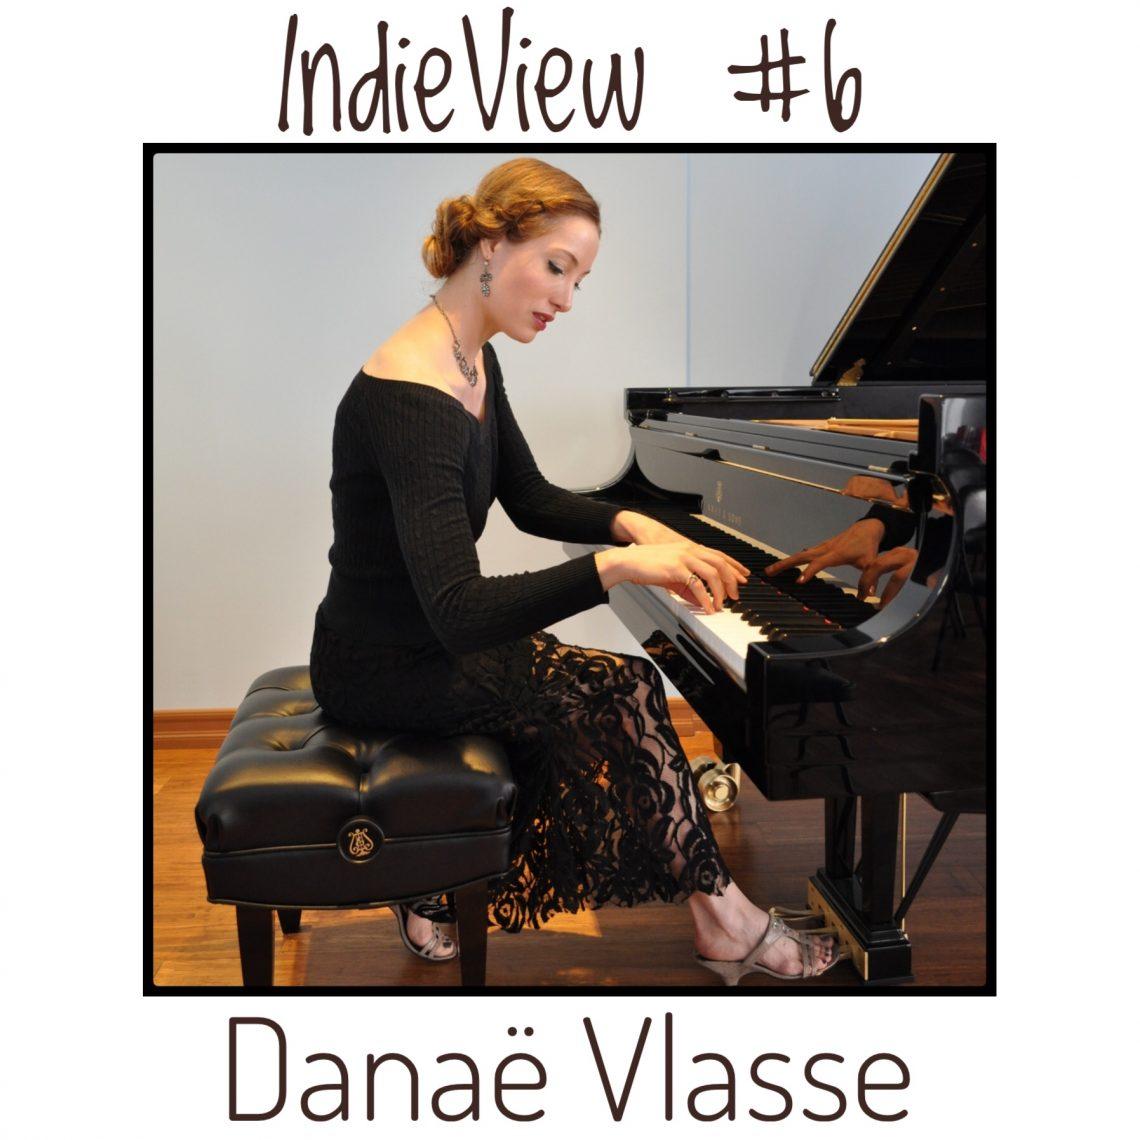 danae-Vlasse-Indieviews-pianist-composer